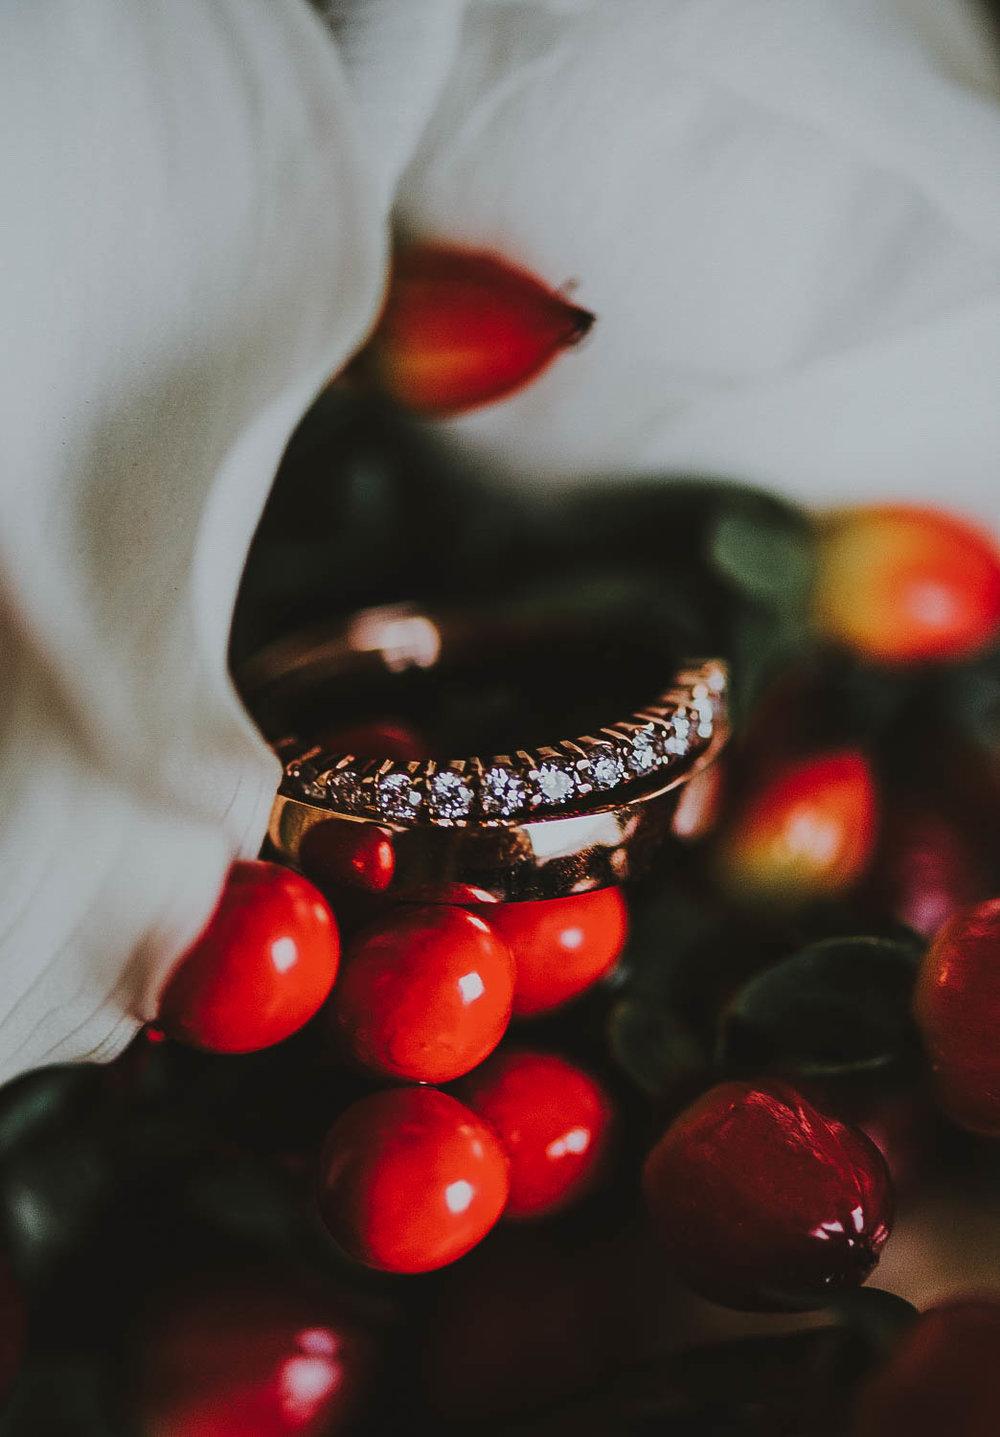 ecaterina-chandu-dondeti-wedding-photography36.jpg